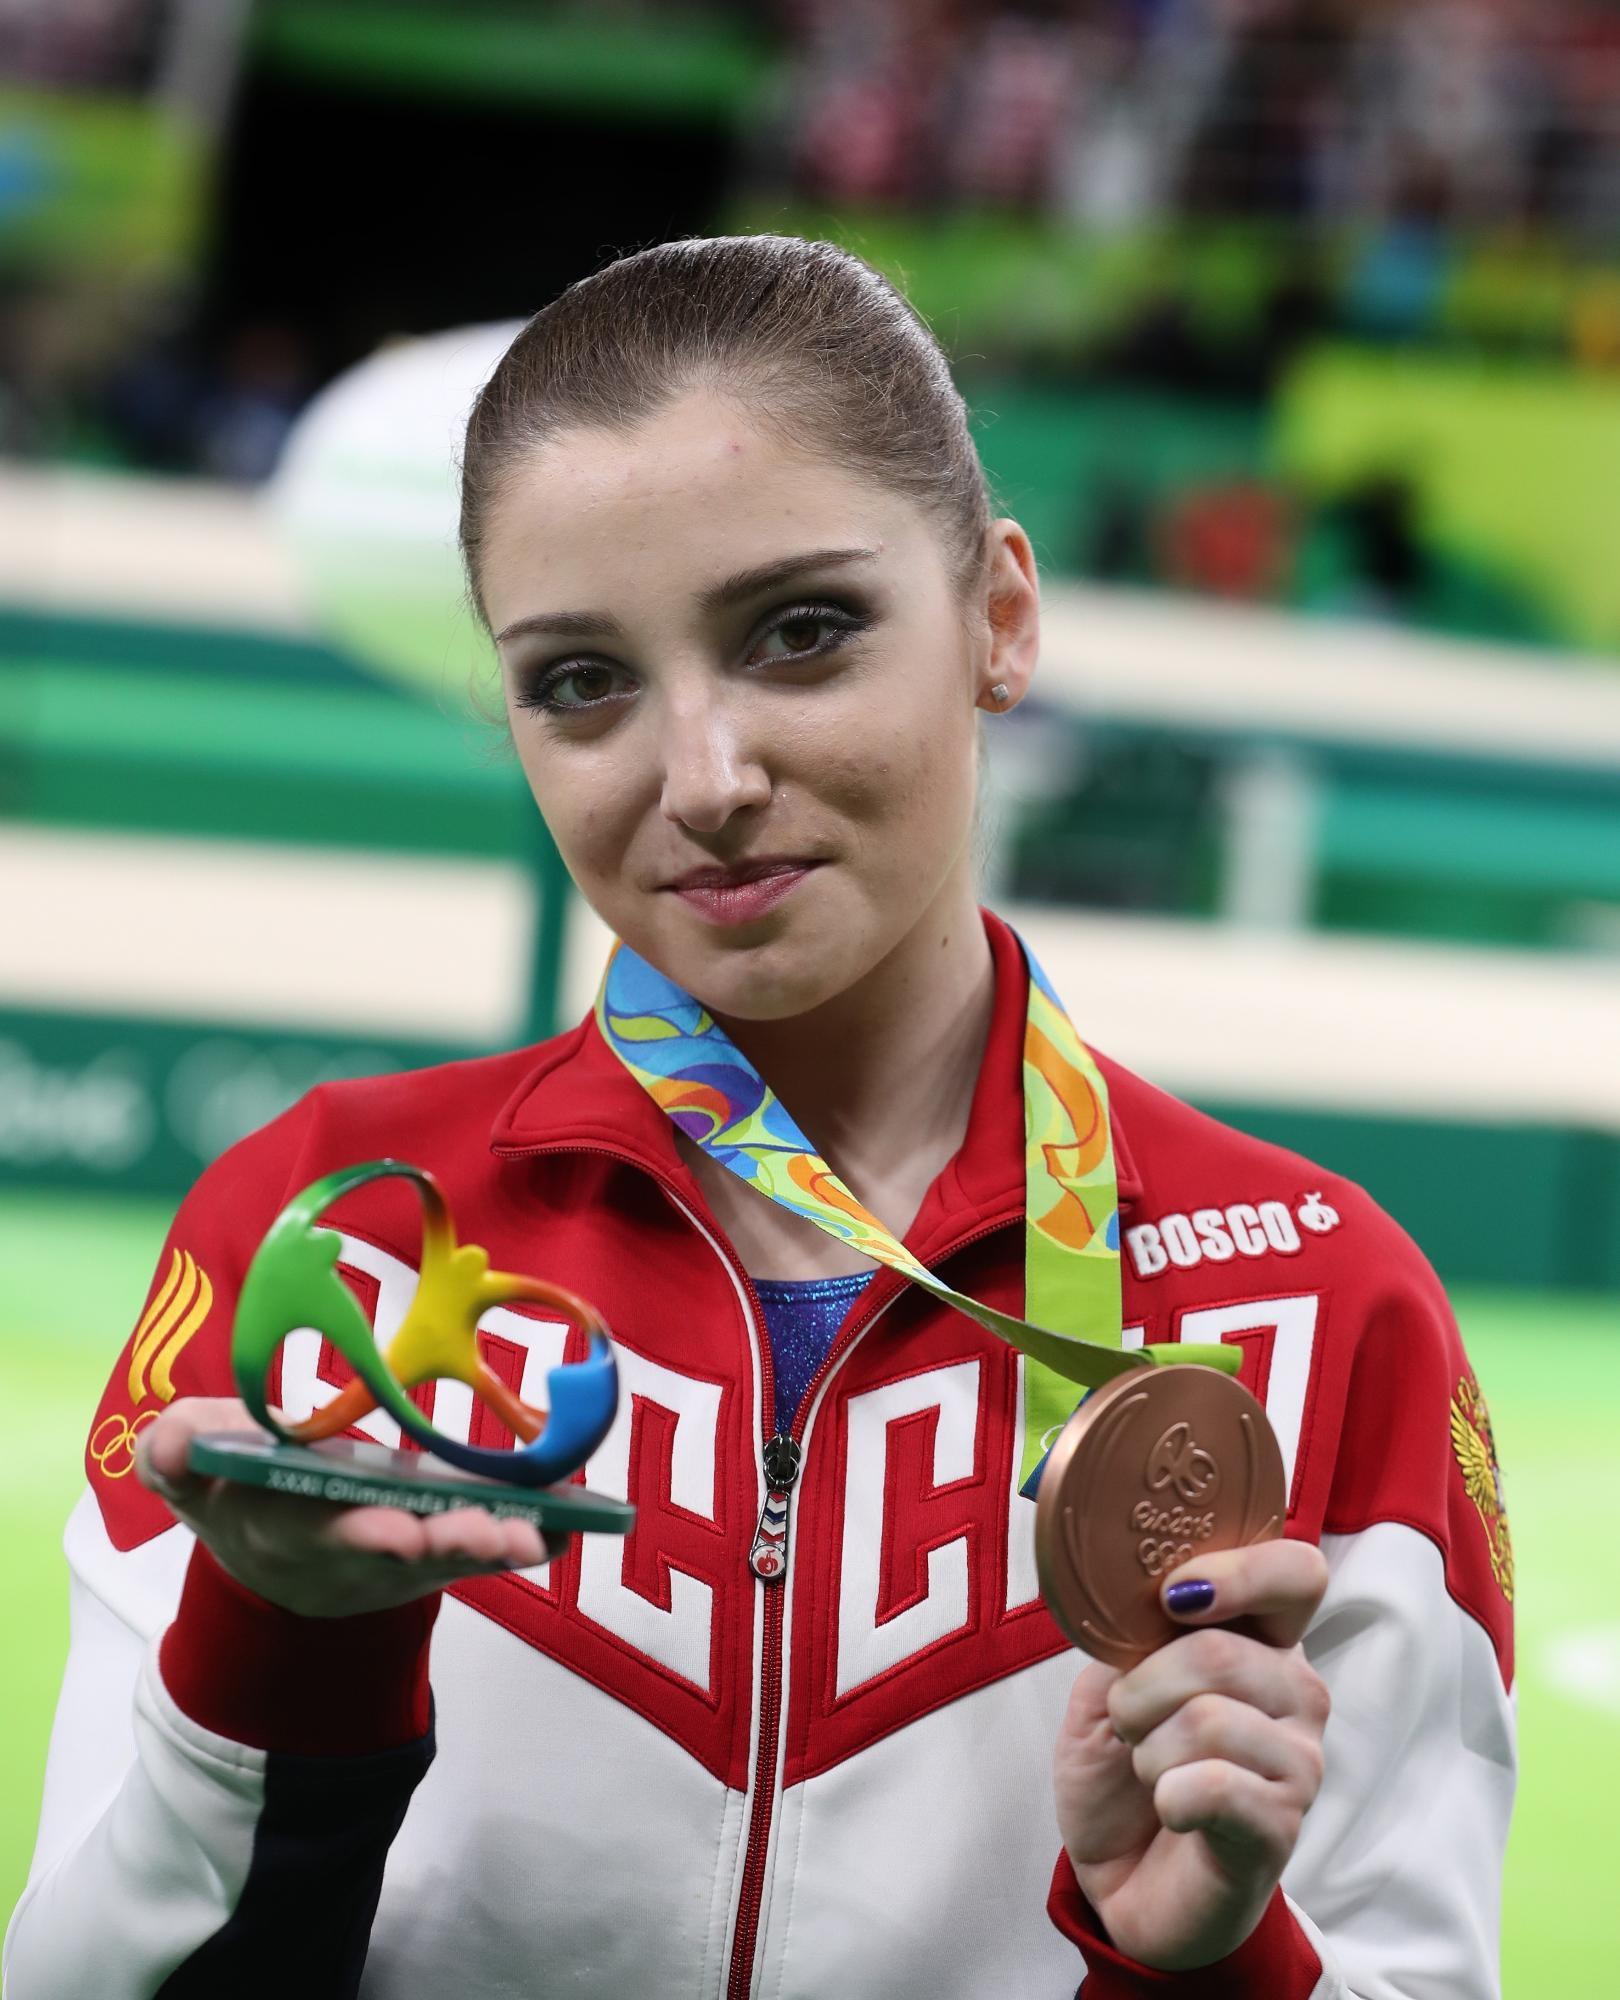 russkie-devushki-sportsmenki-s-olimpiadi